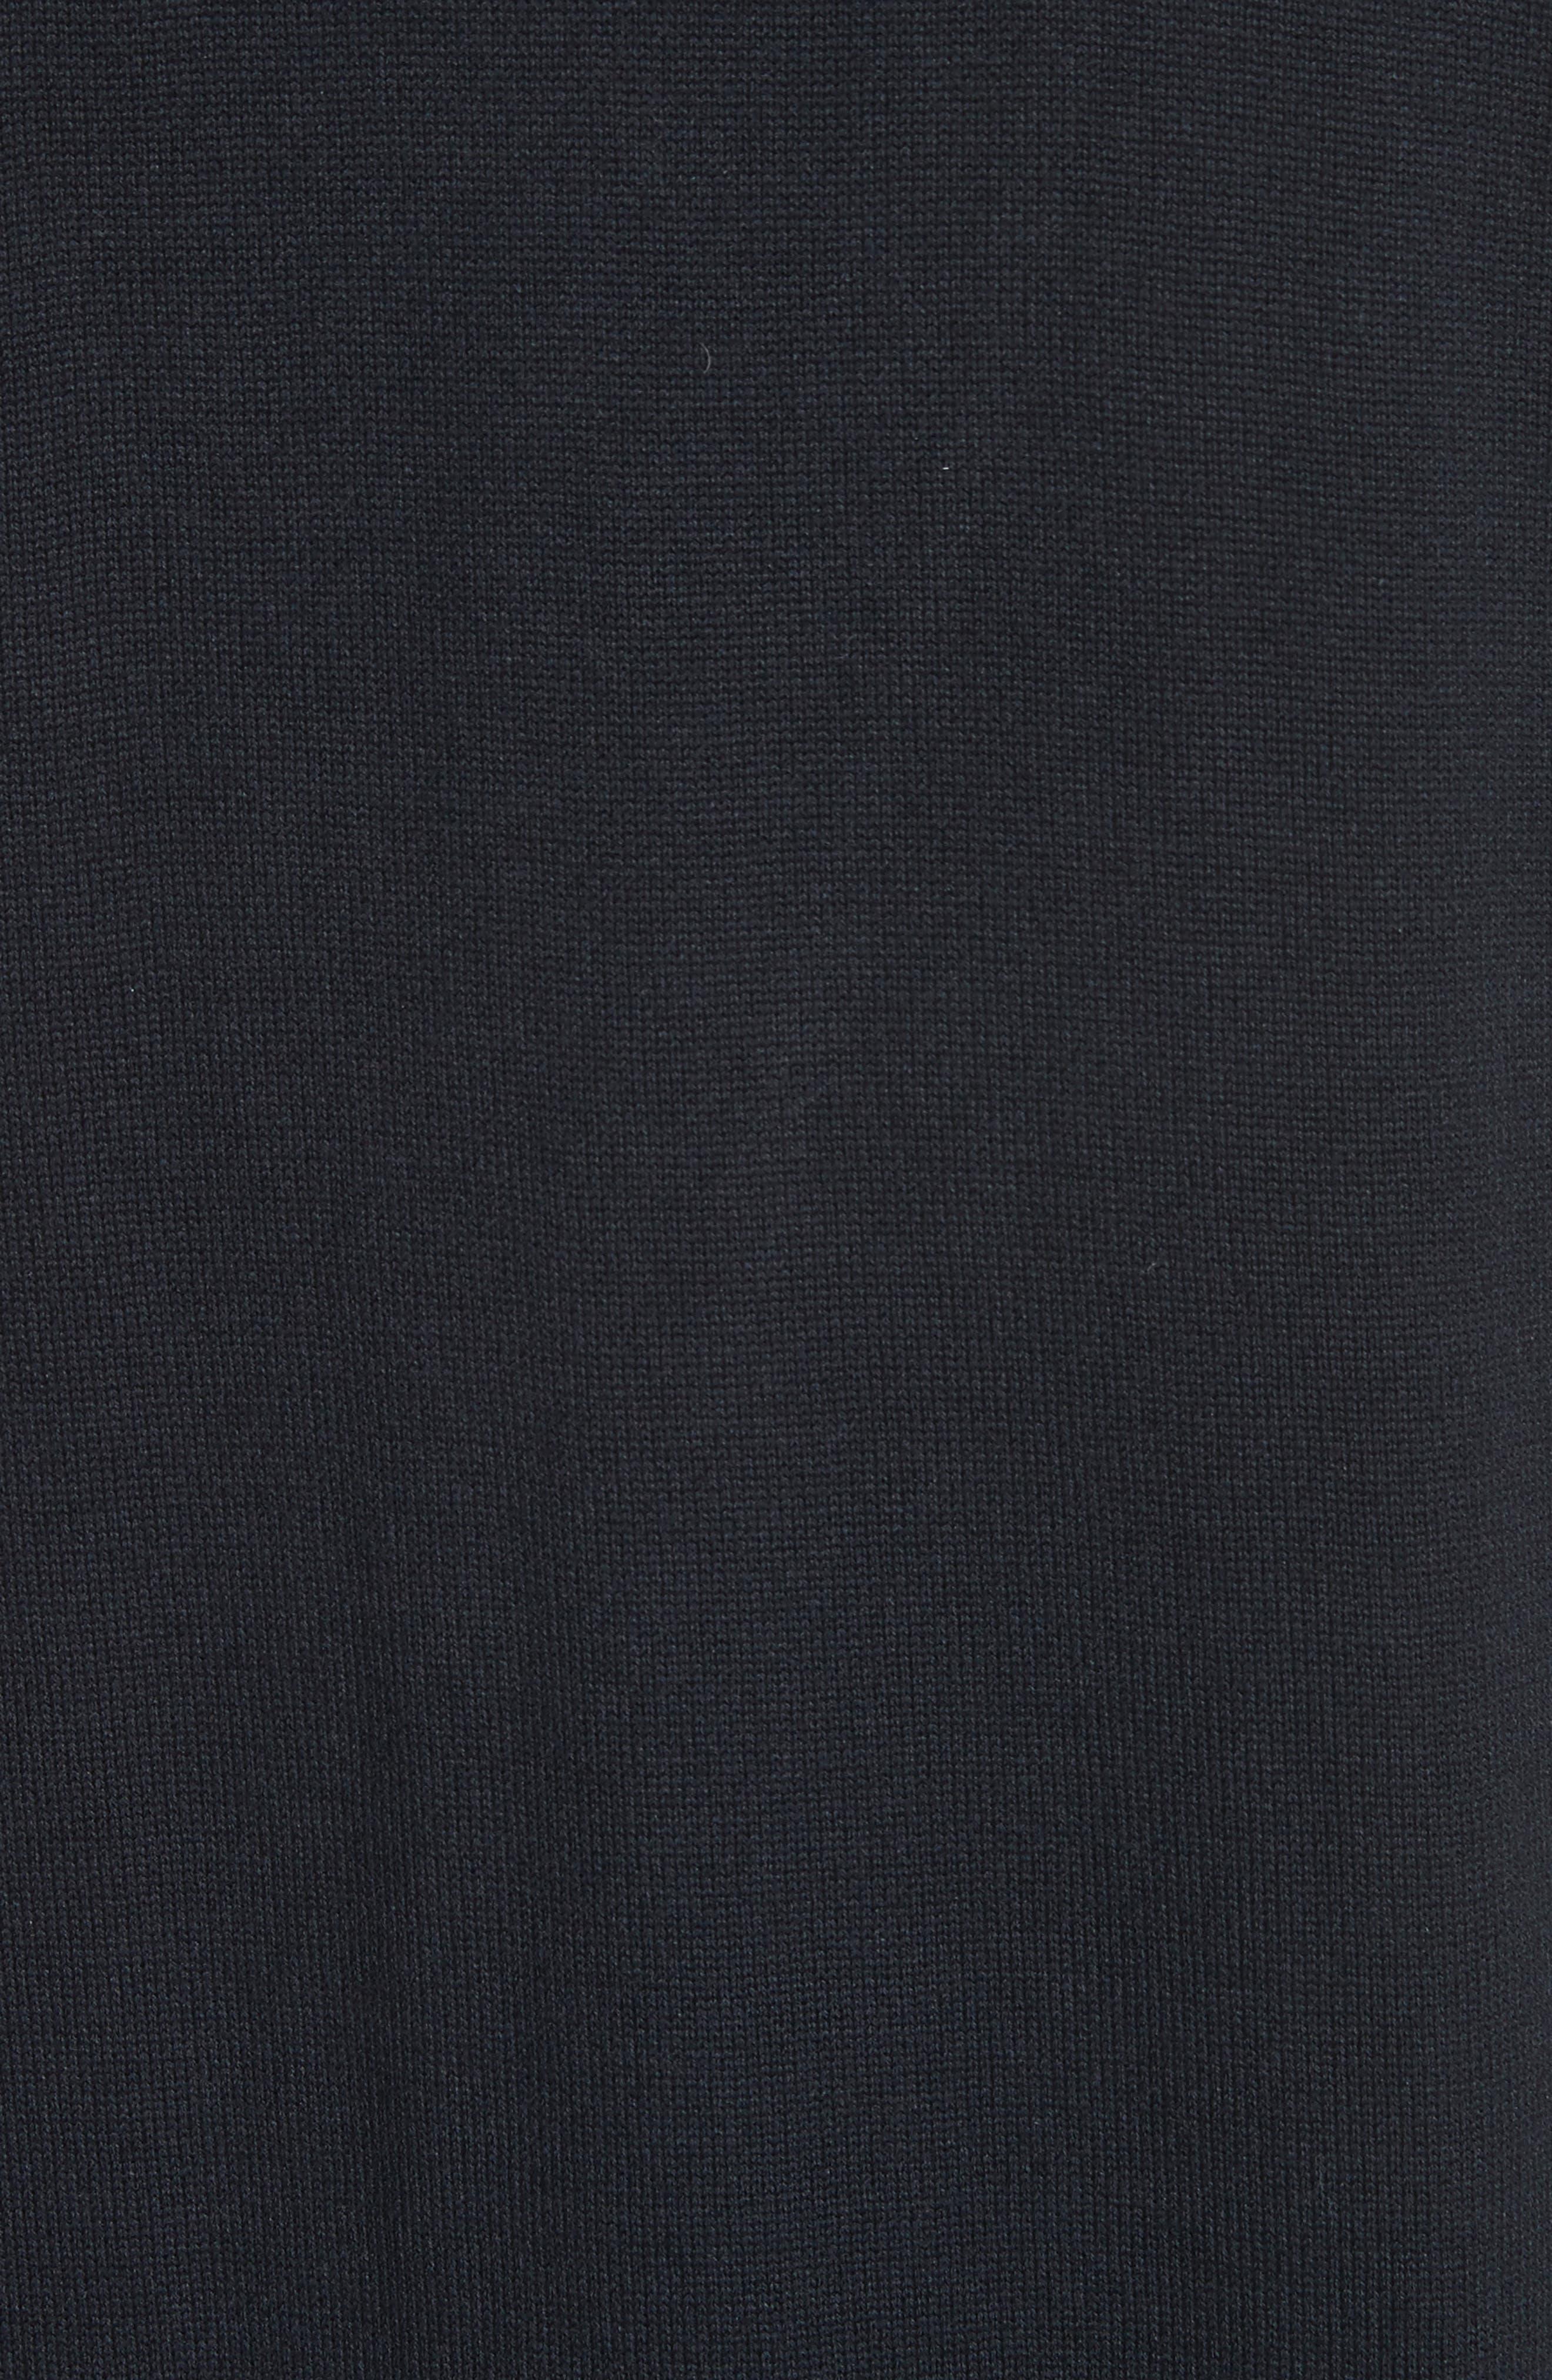 Pleat Ruffle Trim Cardigan,                             Alternate thumbnail 5, color,                             001